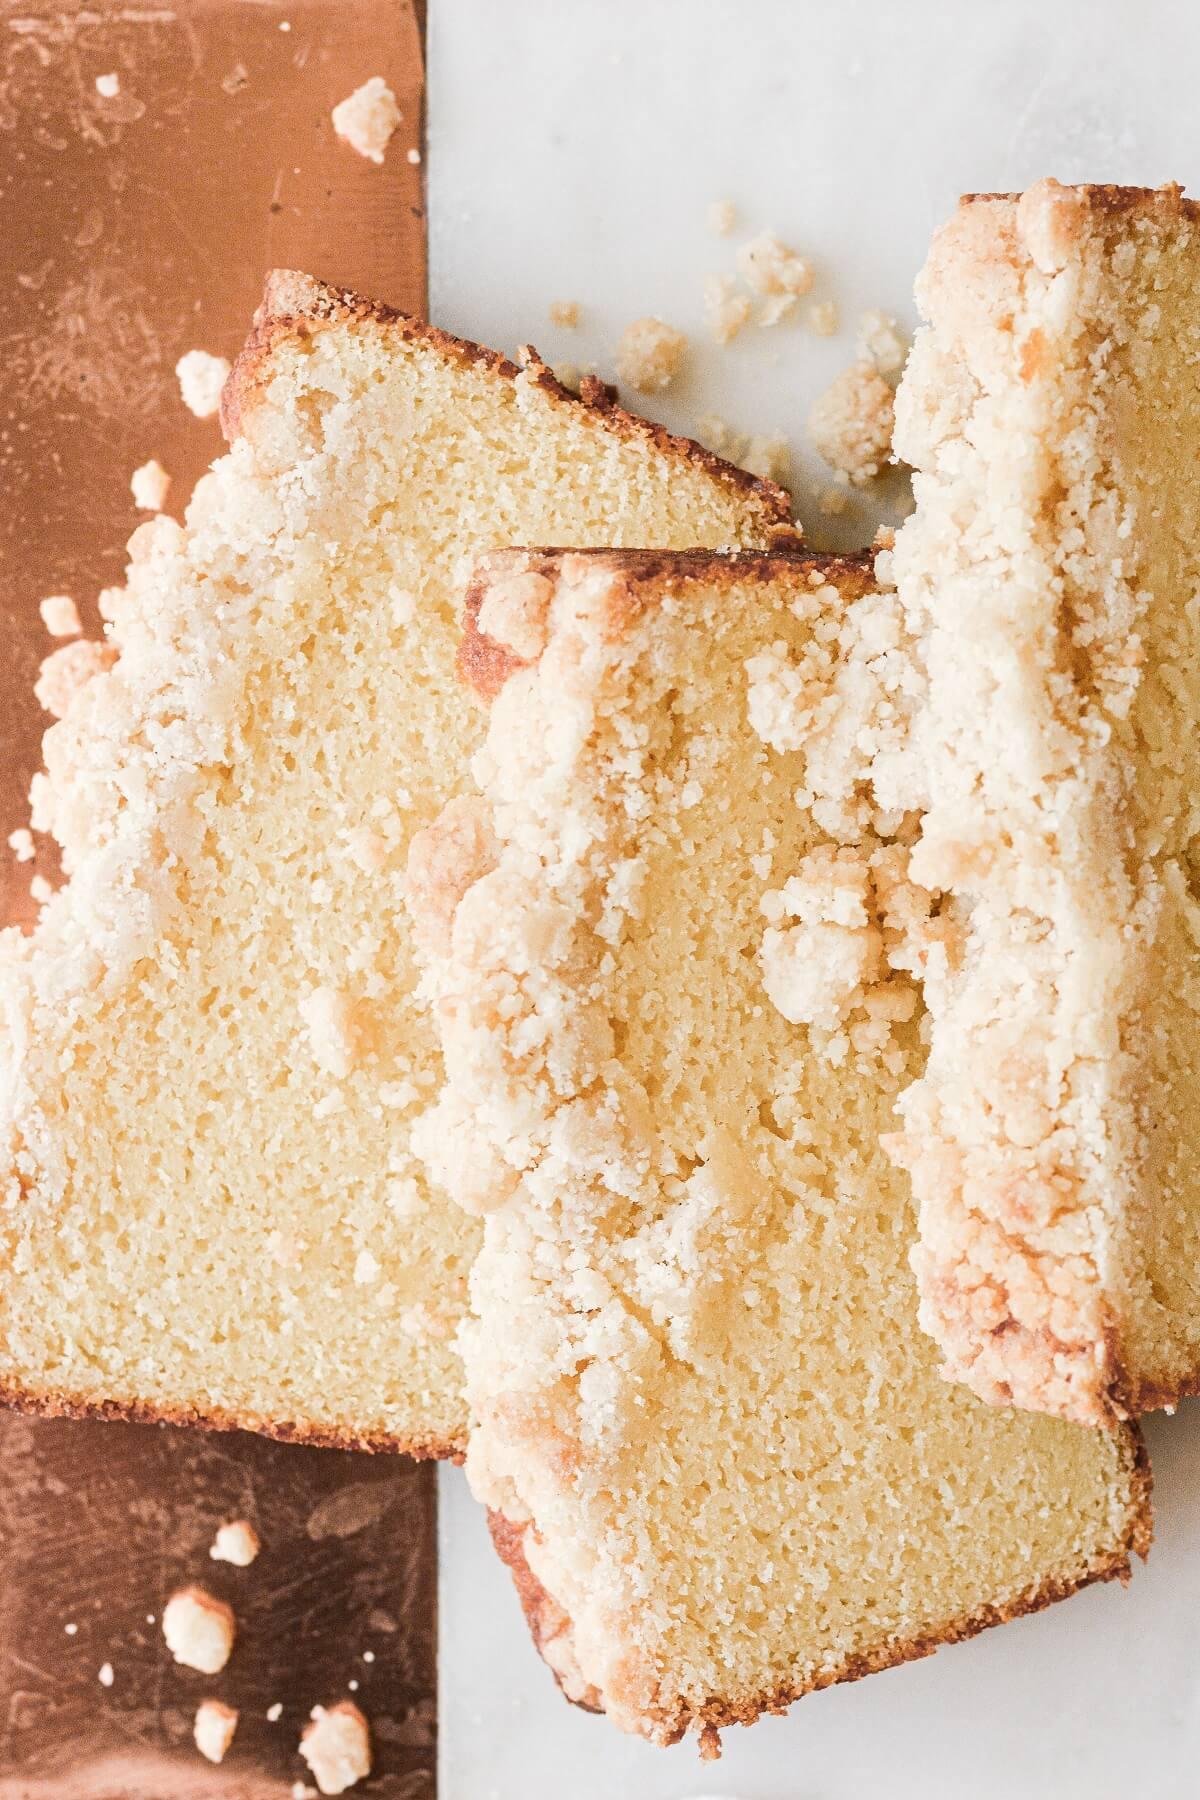 Slices of almond crumb pound cake.